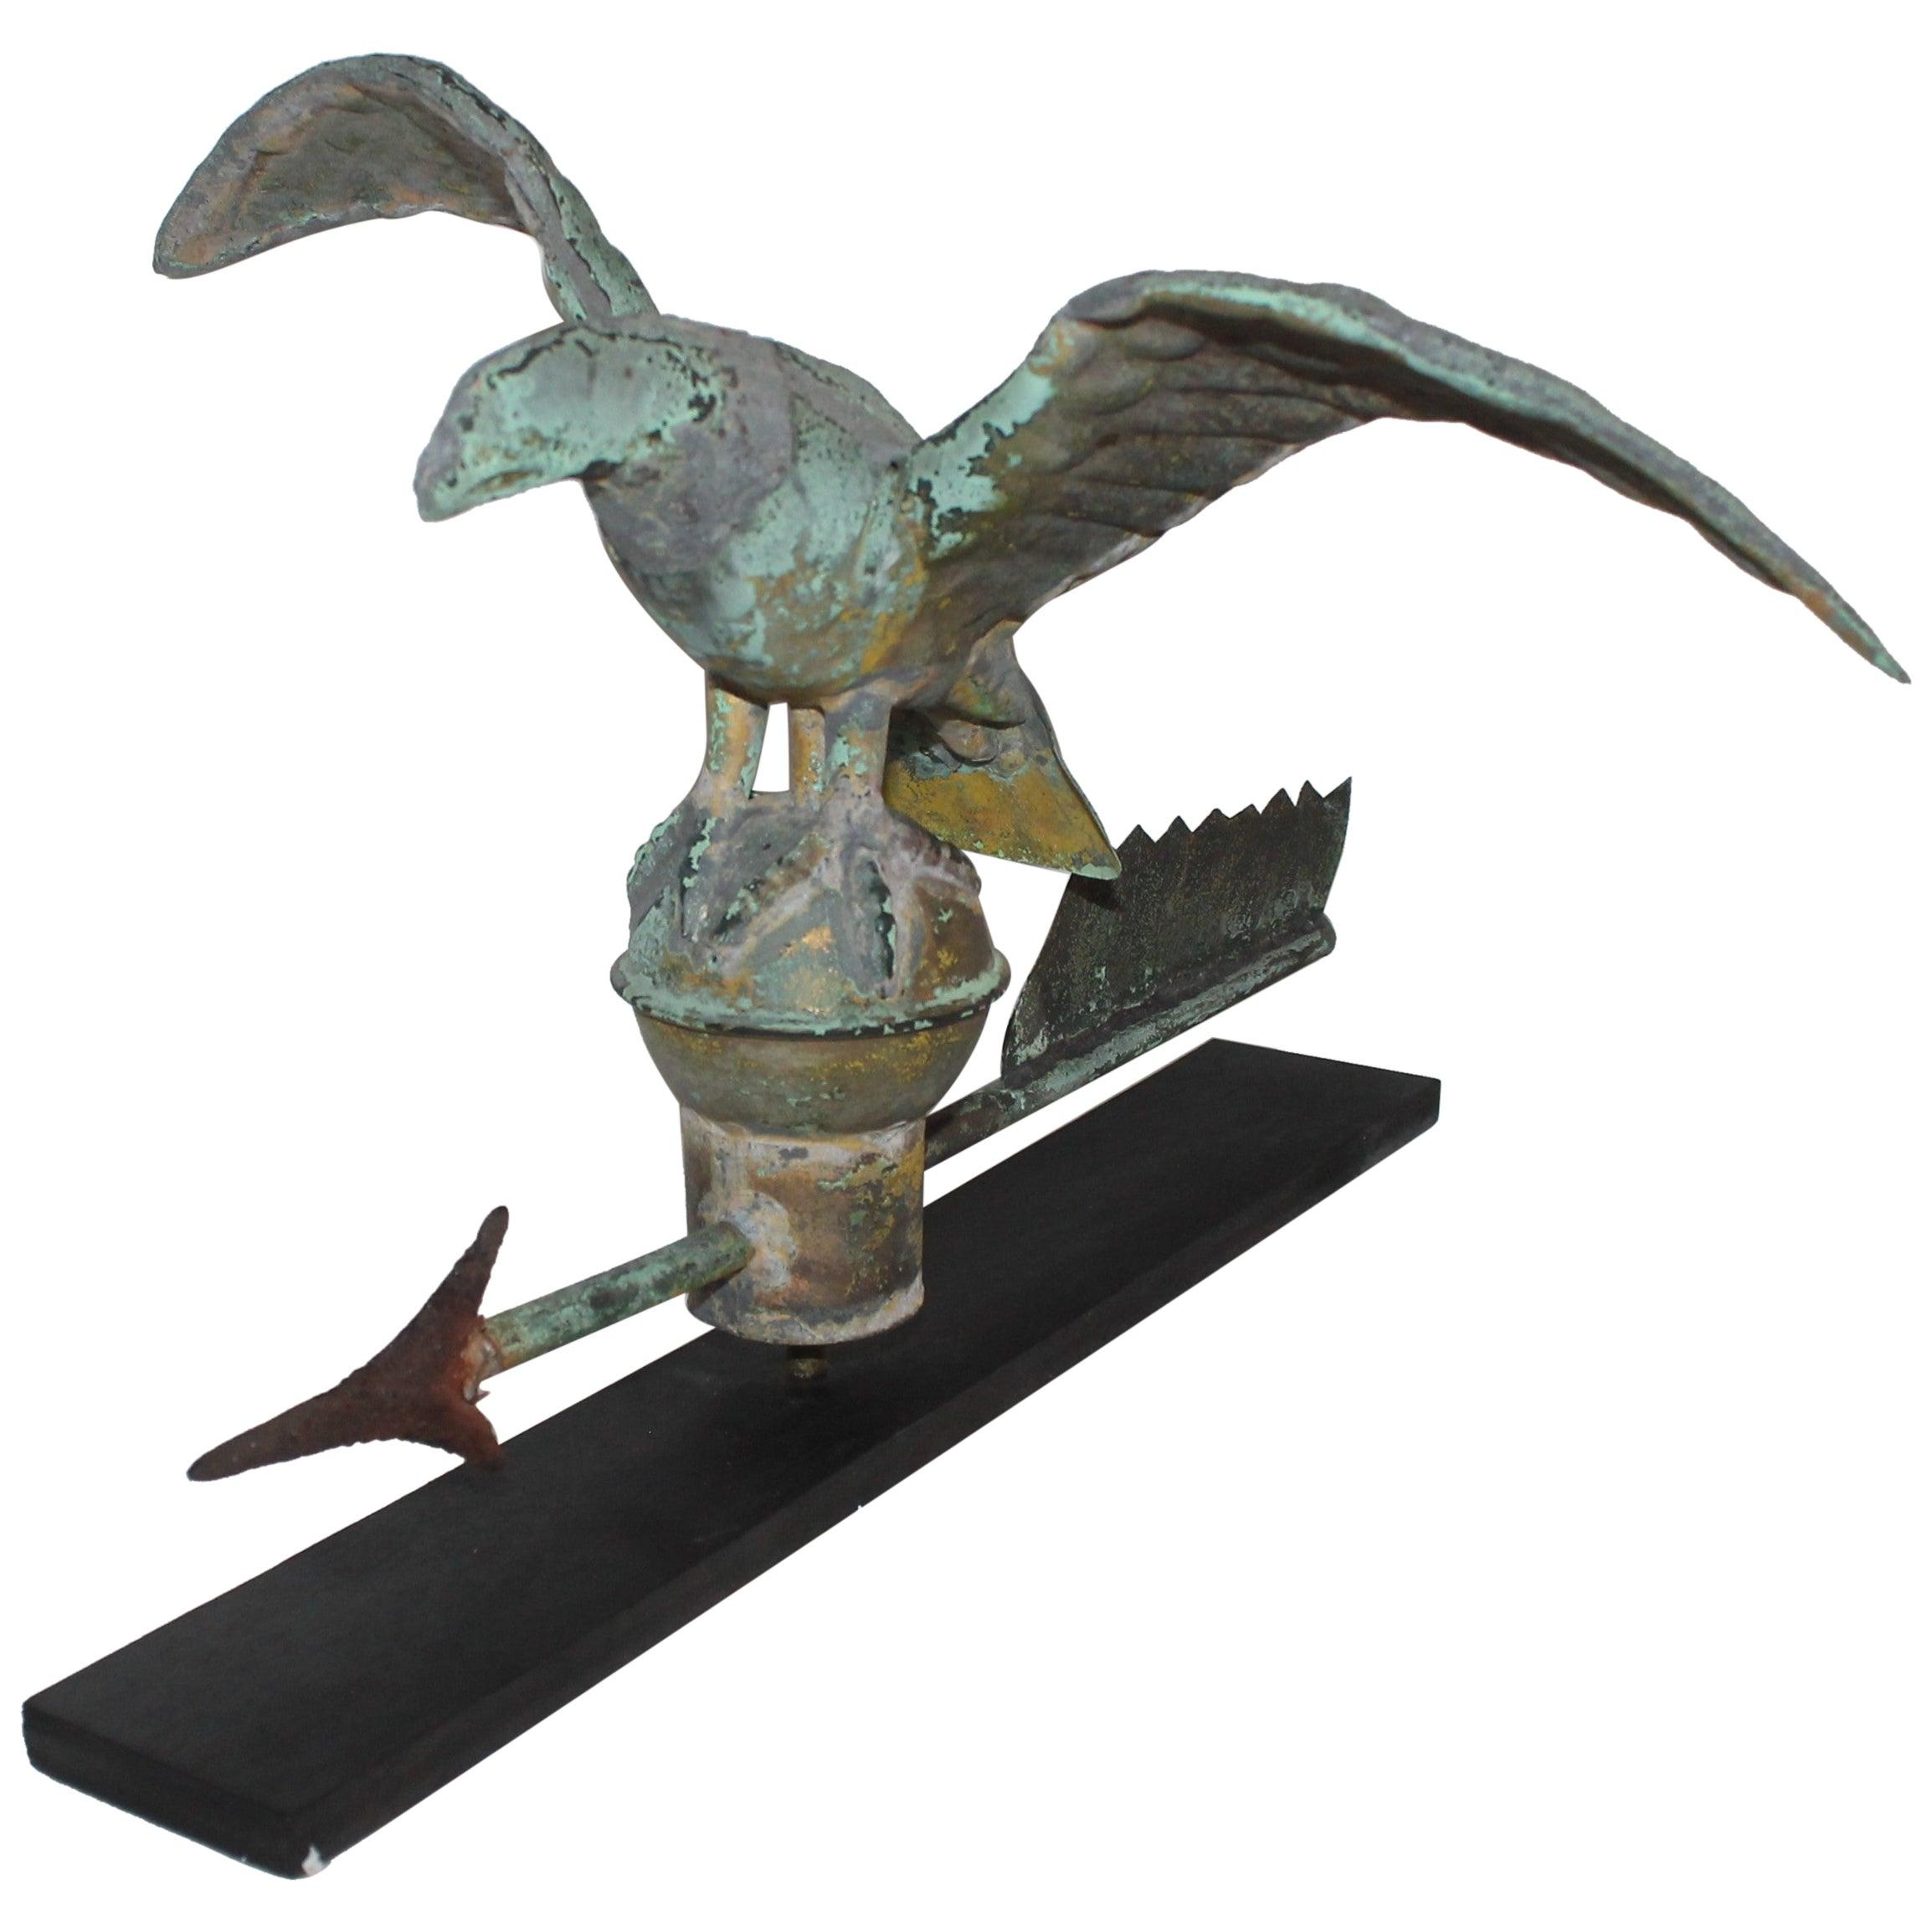 19th Century Mini Eagle Weather Vane on Stand